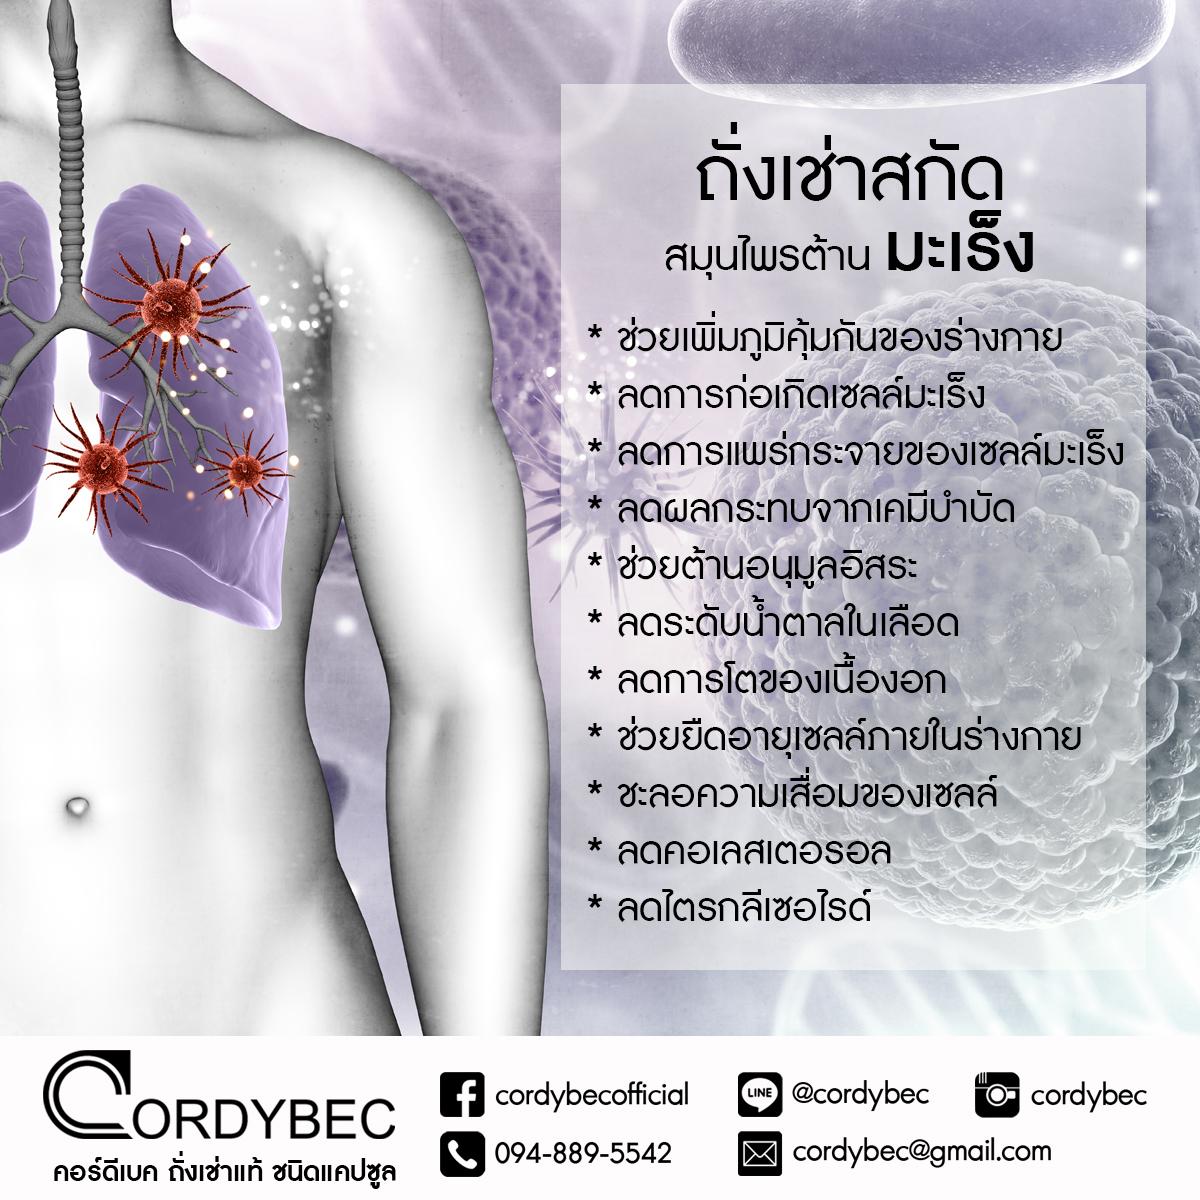 Cordybec มะเร็ง 002